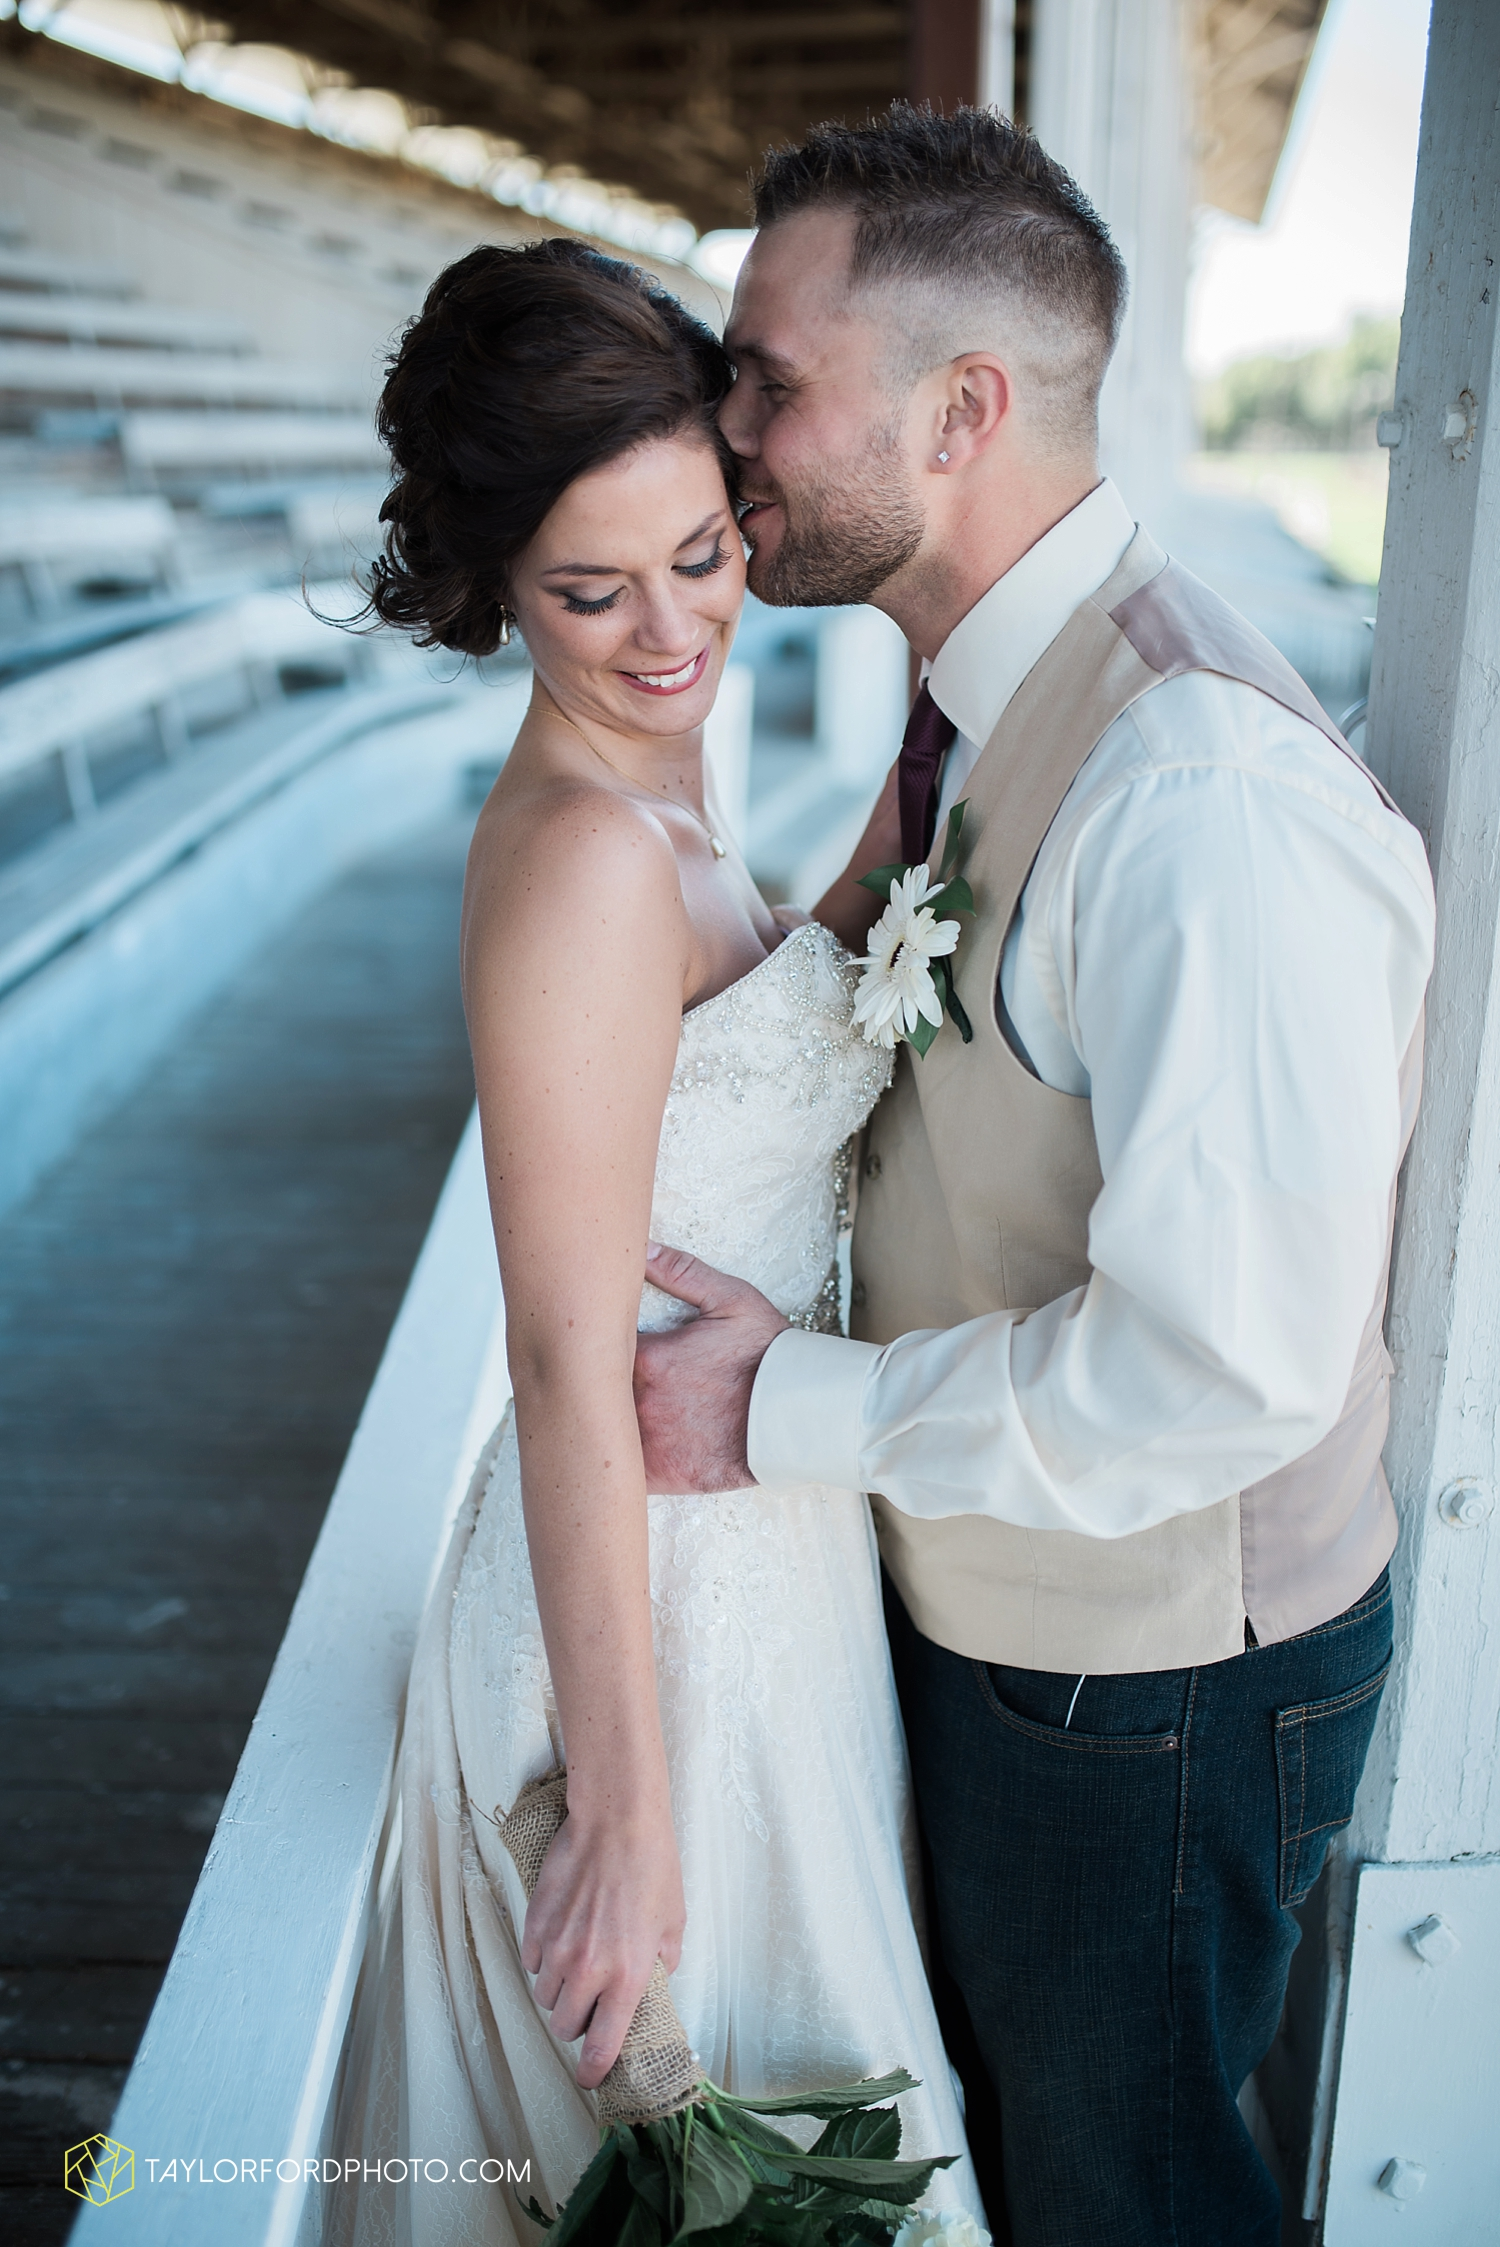 van_wert_ohio_dairy_barn_fairgrounds_fort_wayne_indiana_wedding_photographer_taylor_ford_3270.jpg